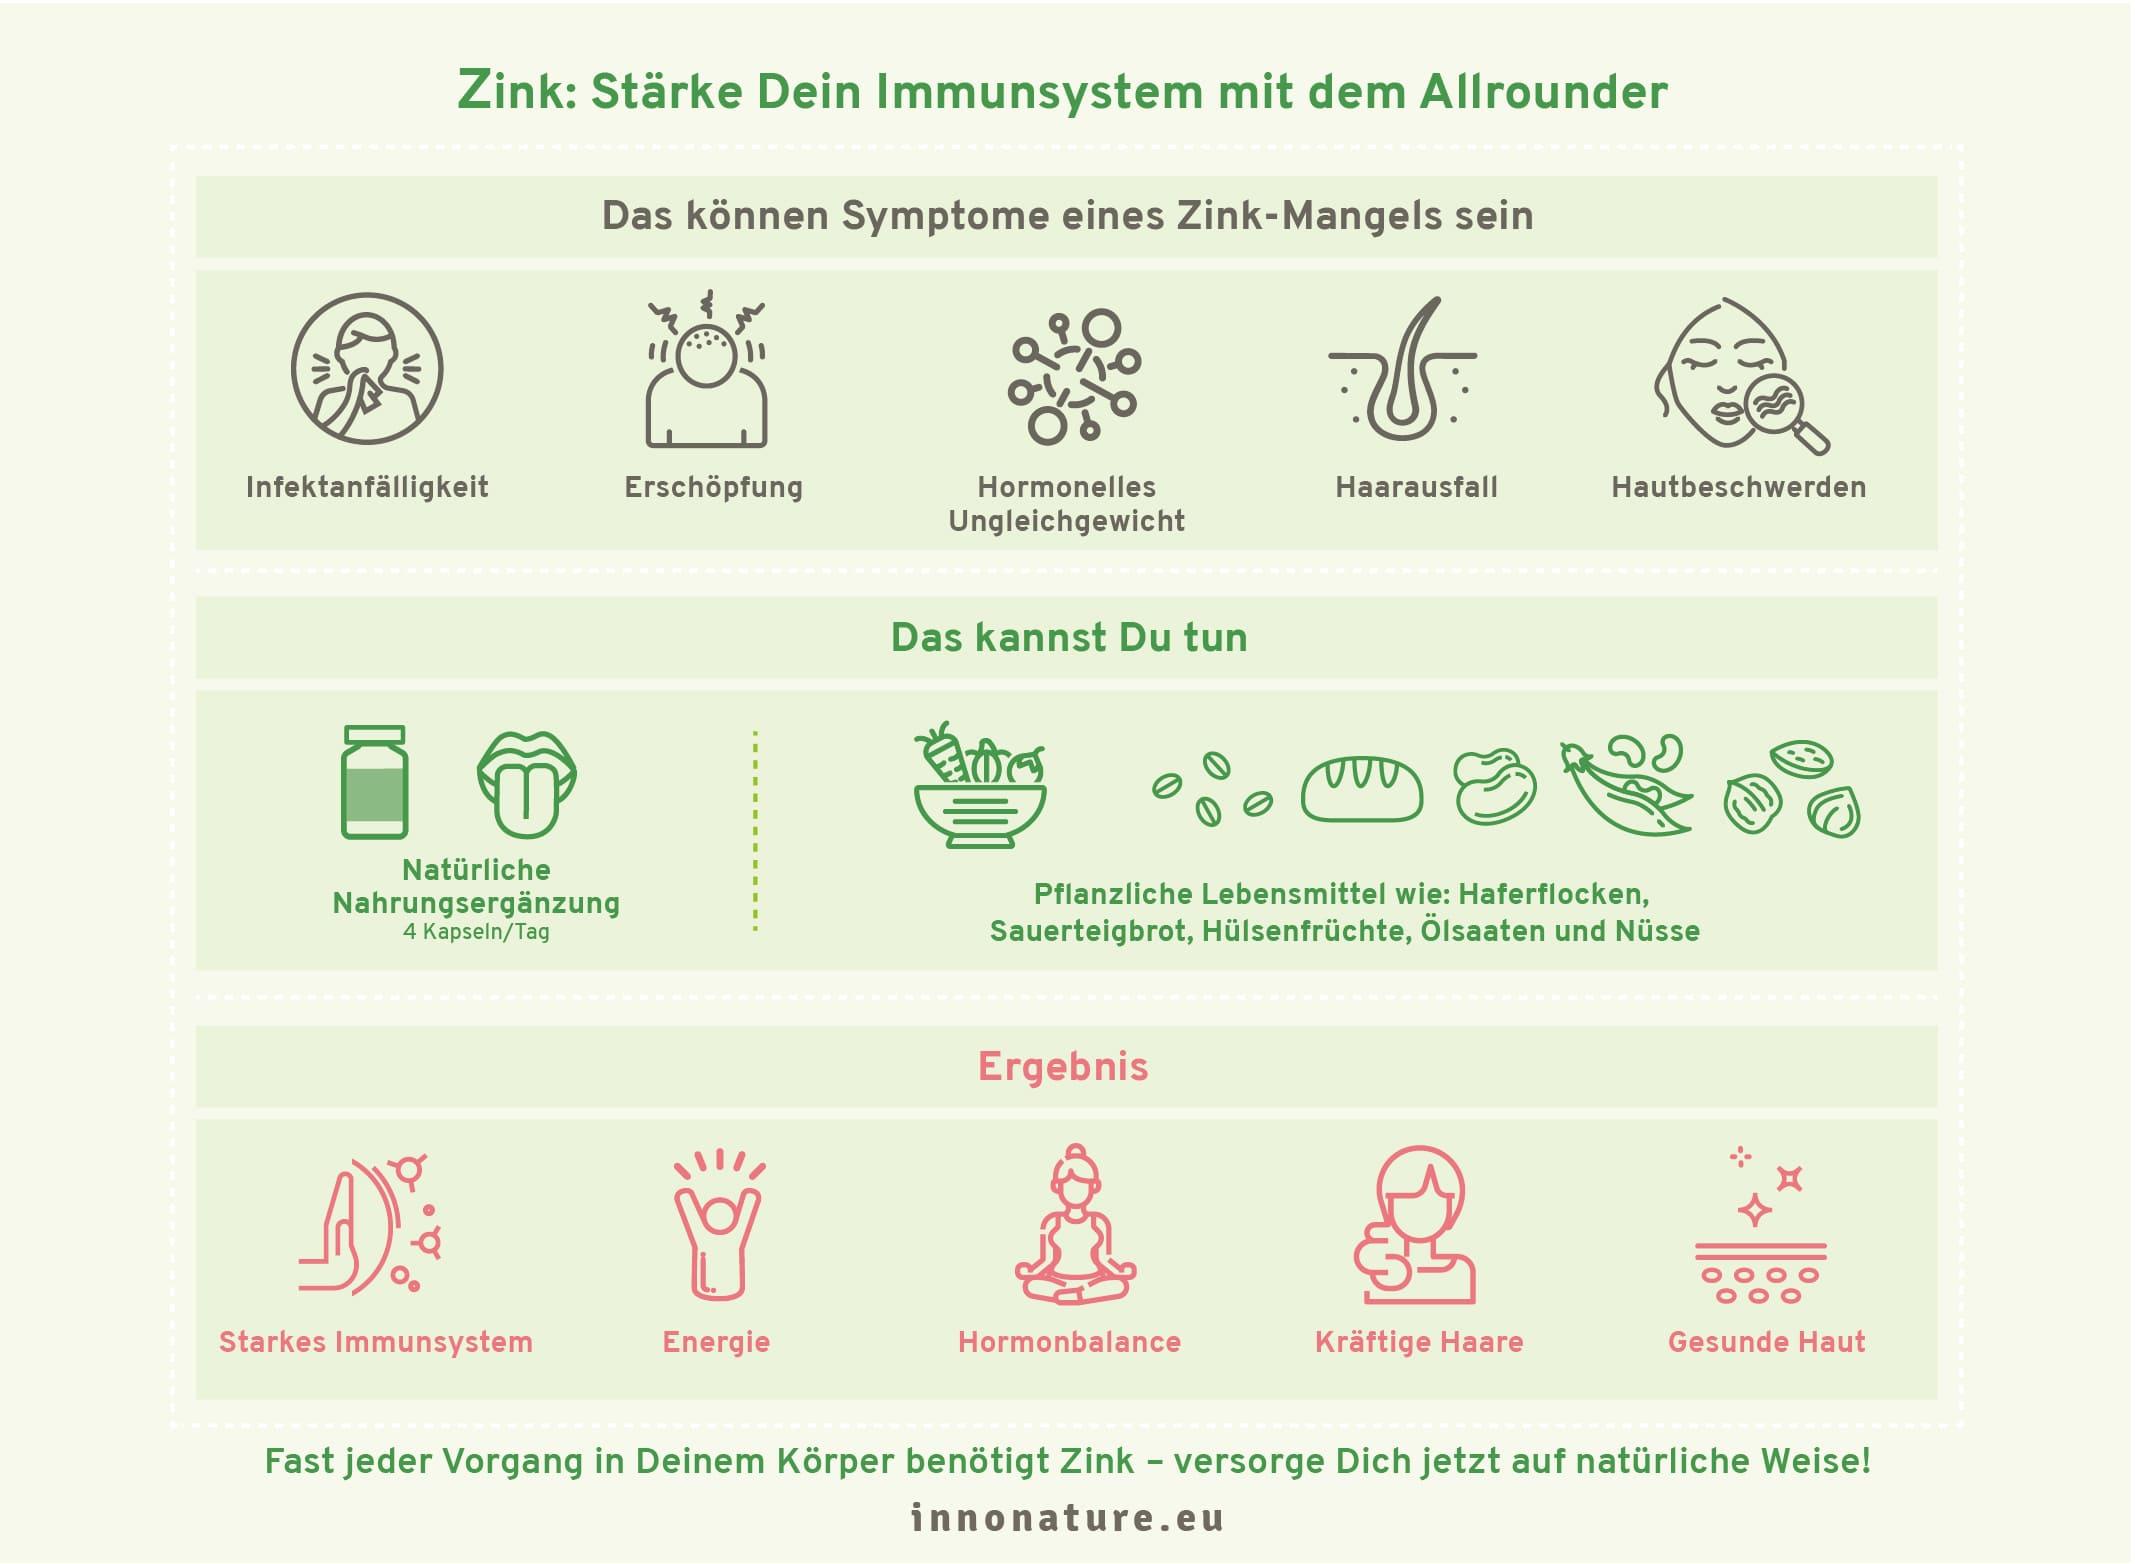 Mintfarbene Grafik von InnoNature zu Zinkmangel Symptomen und Maßnahmen